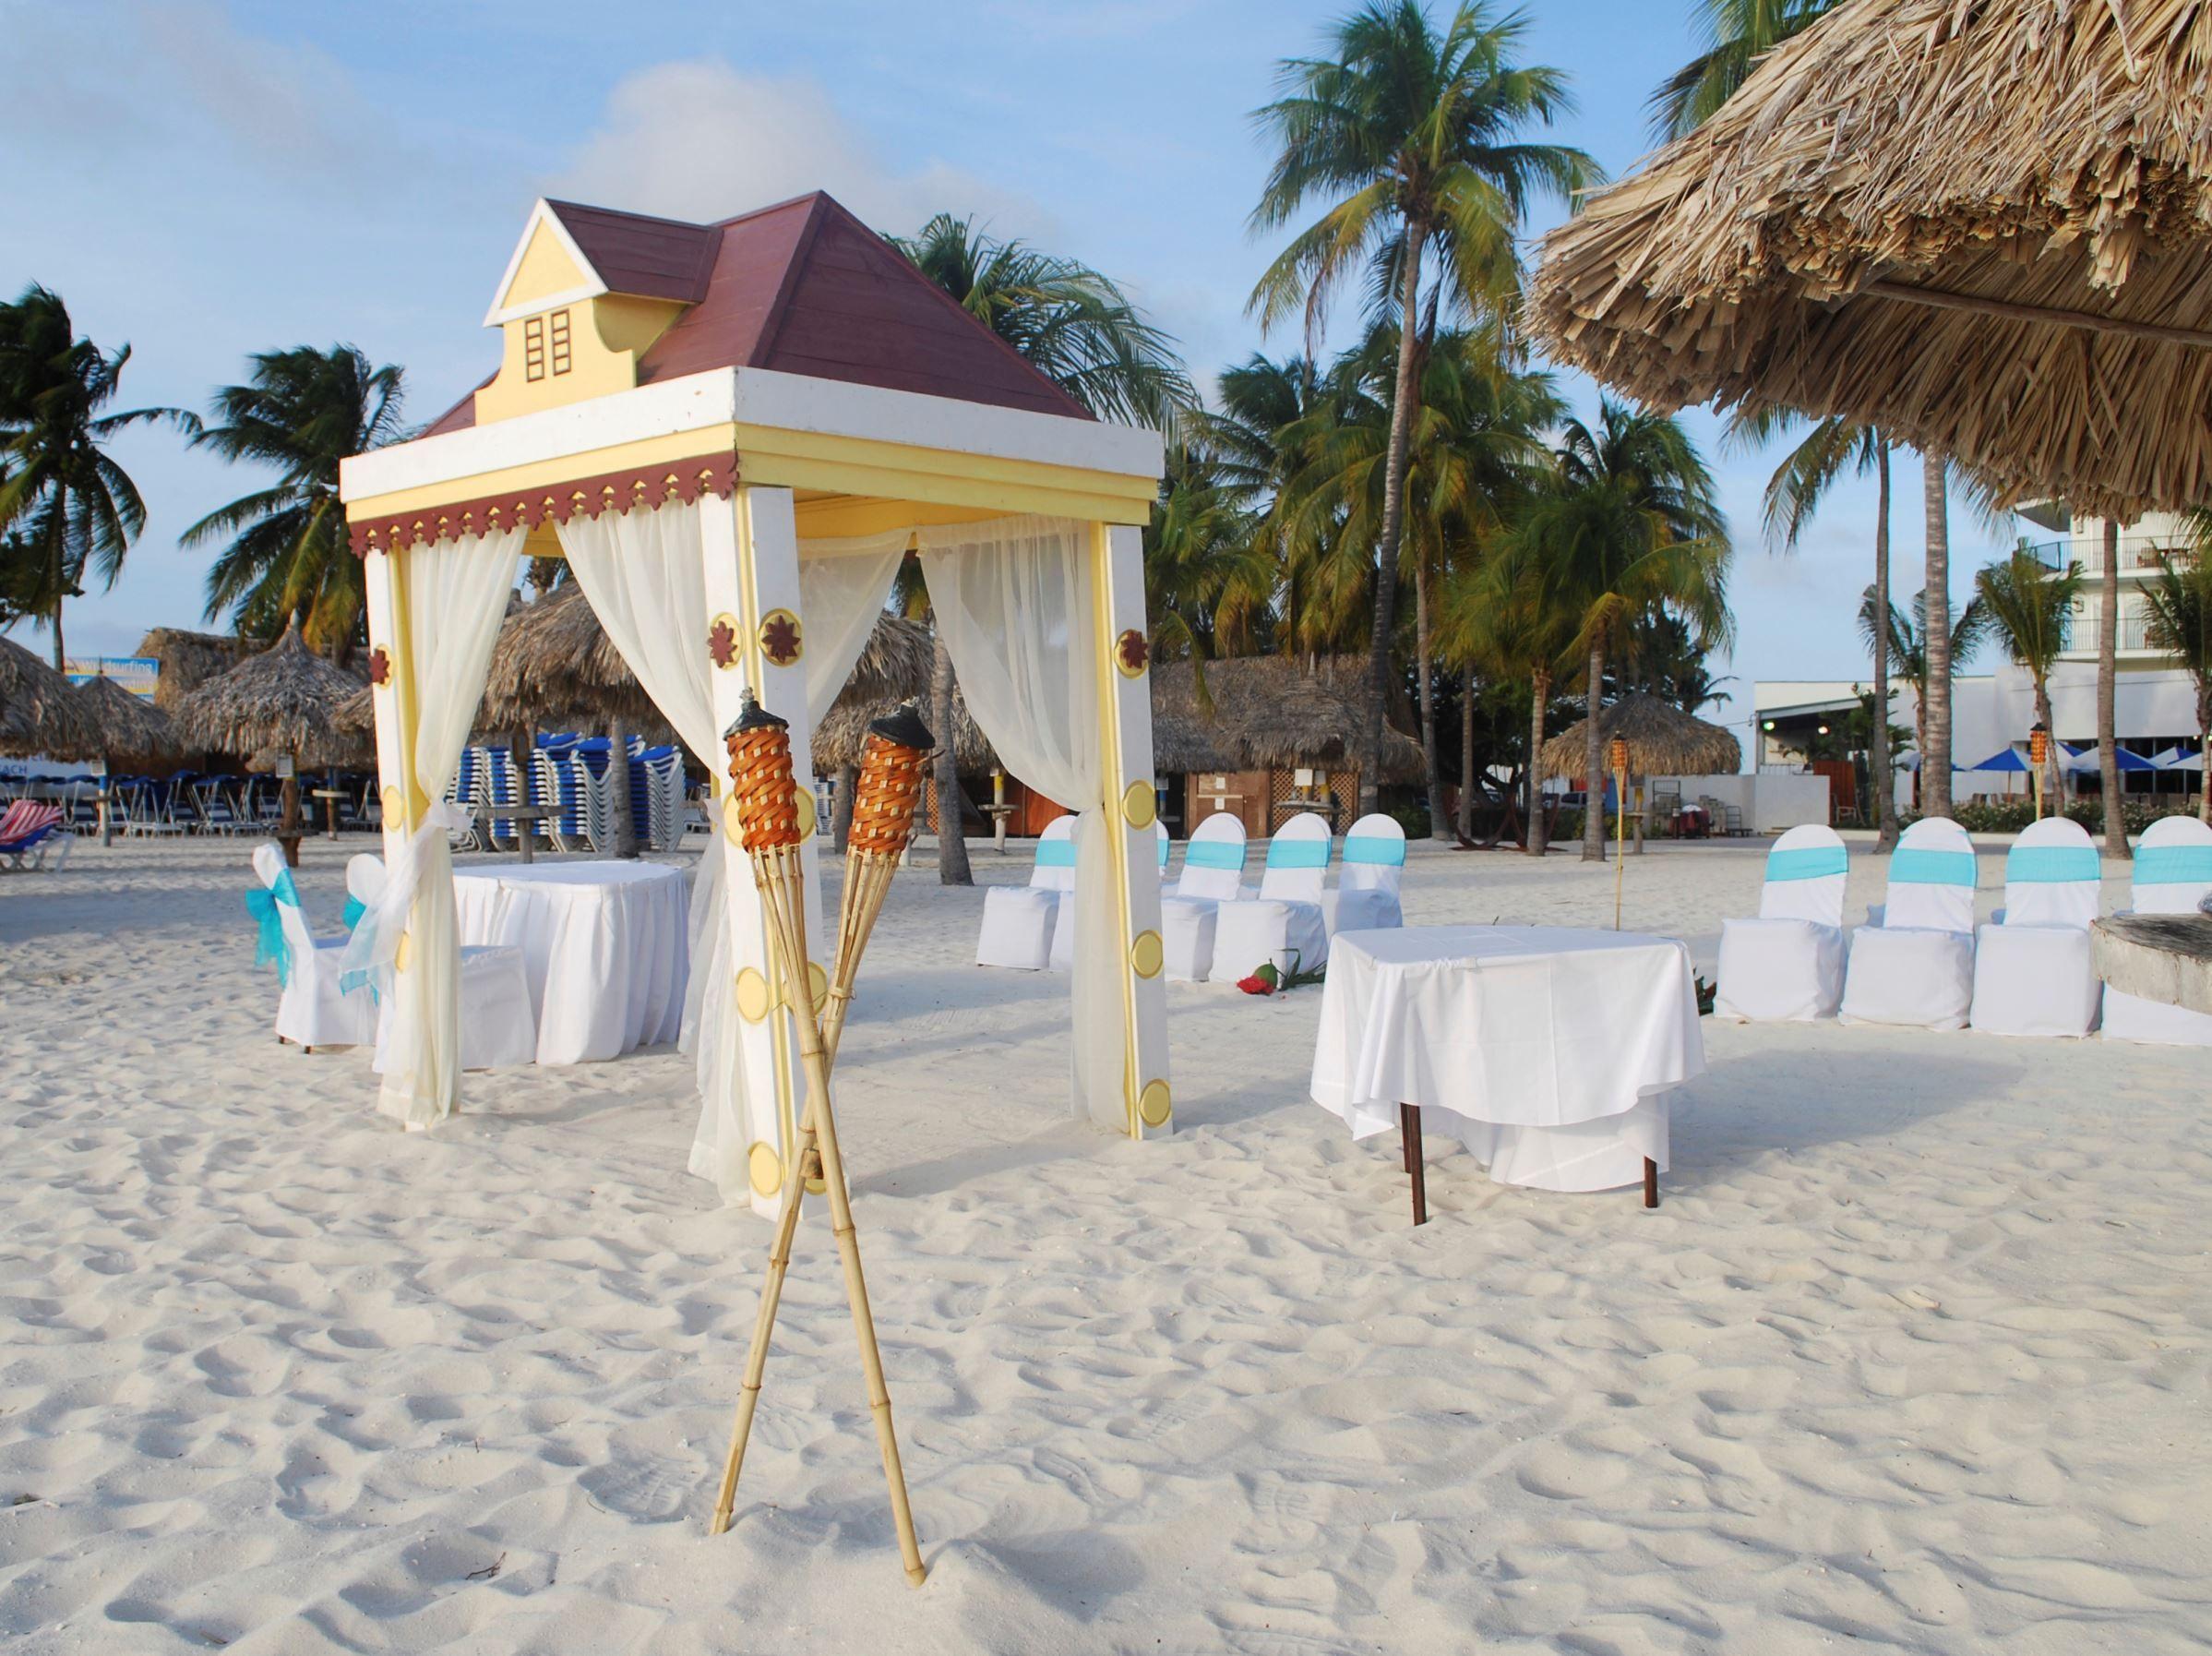 44+ West palm beach wedding venues prices information